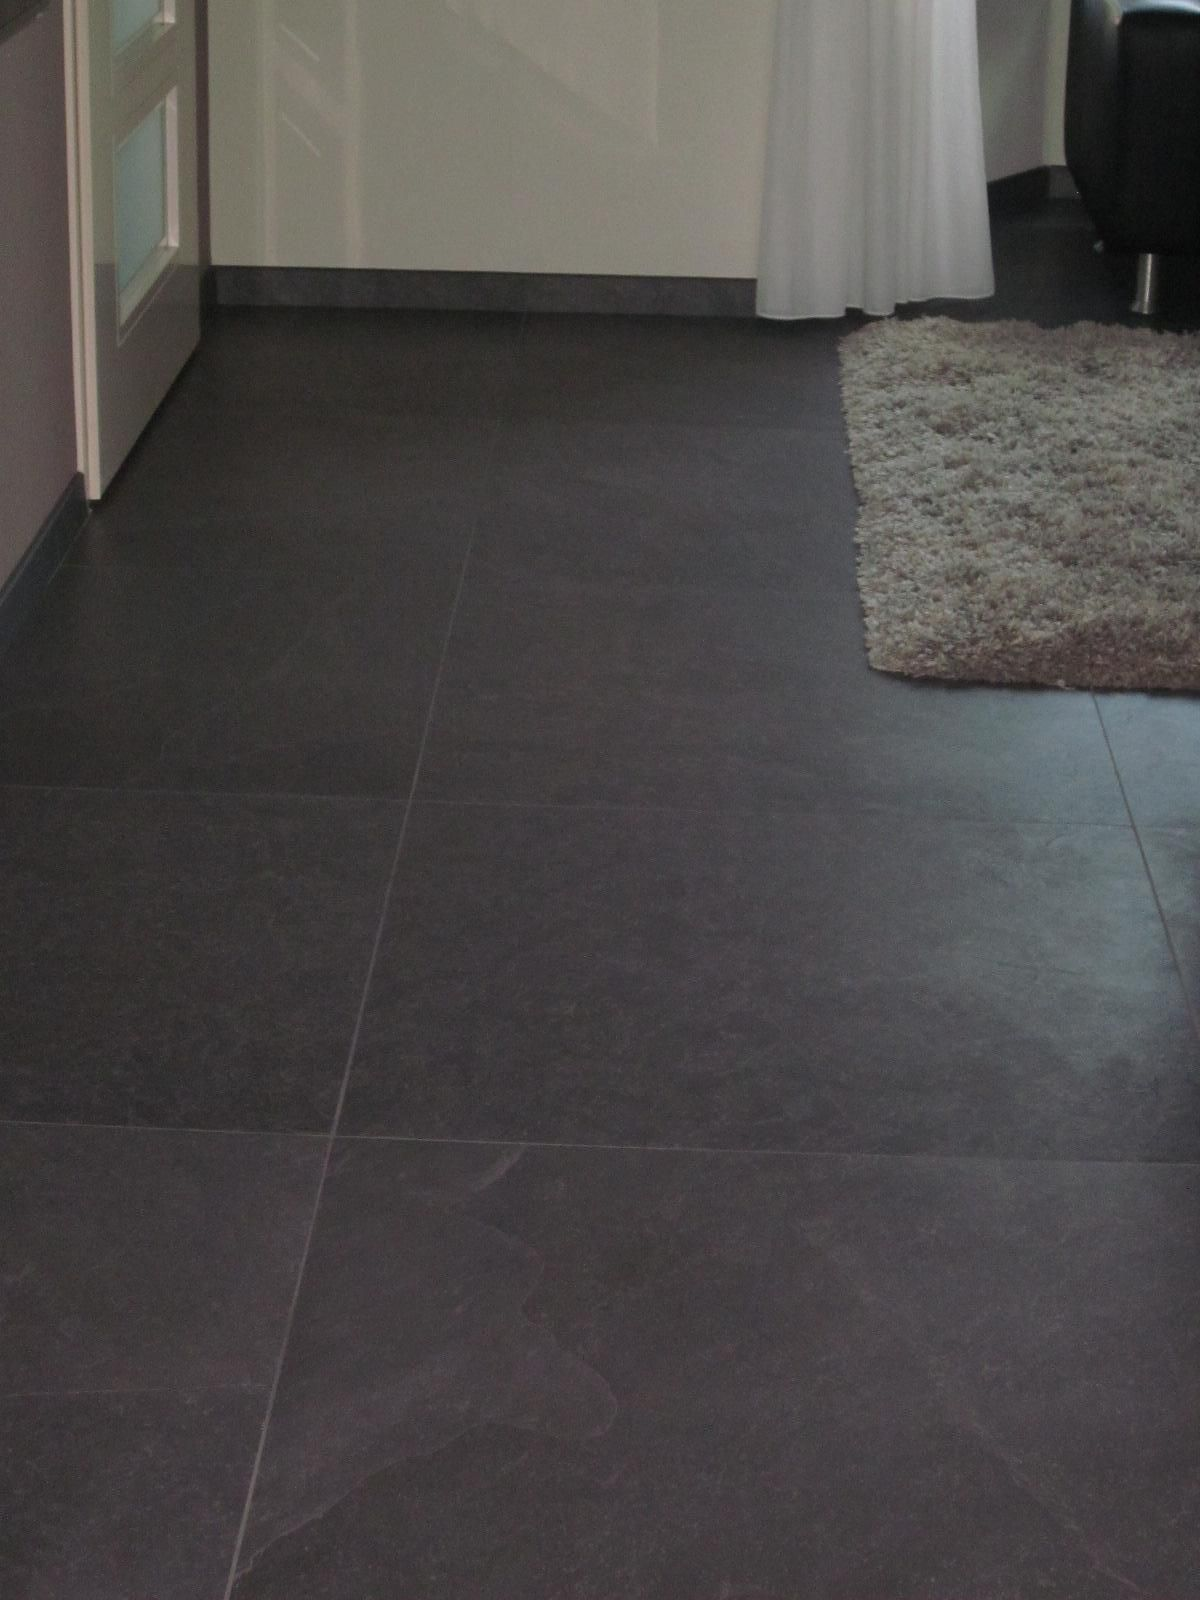 Een keramische leisteen tegel 80x80 15 ak tegelhuys tegelhuys xxl tegels pinterest - Imitatie cement tegels ...